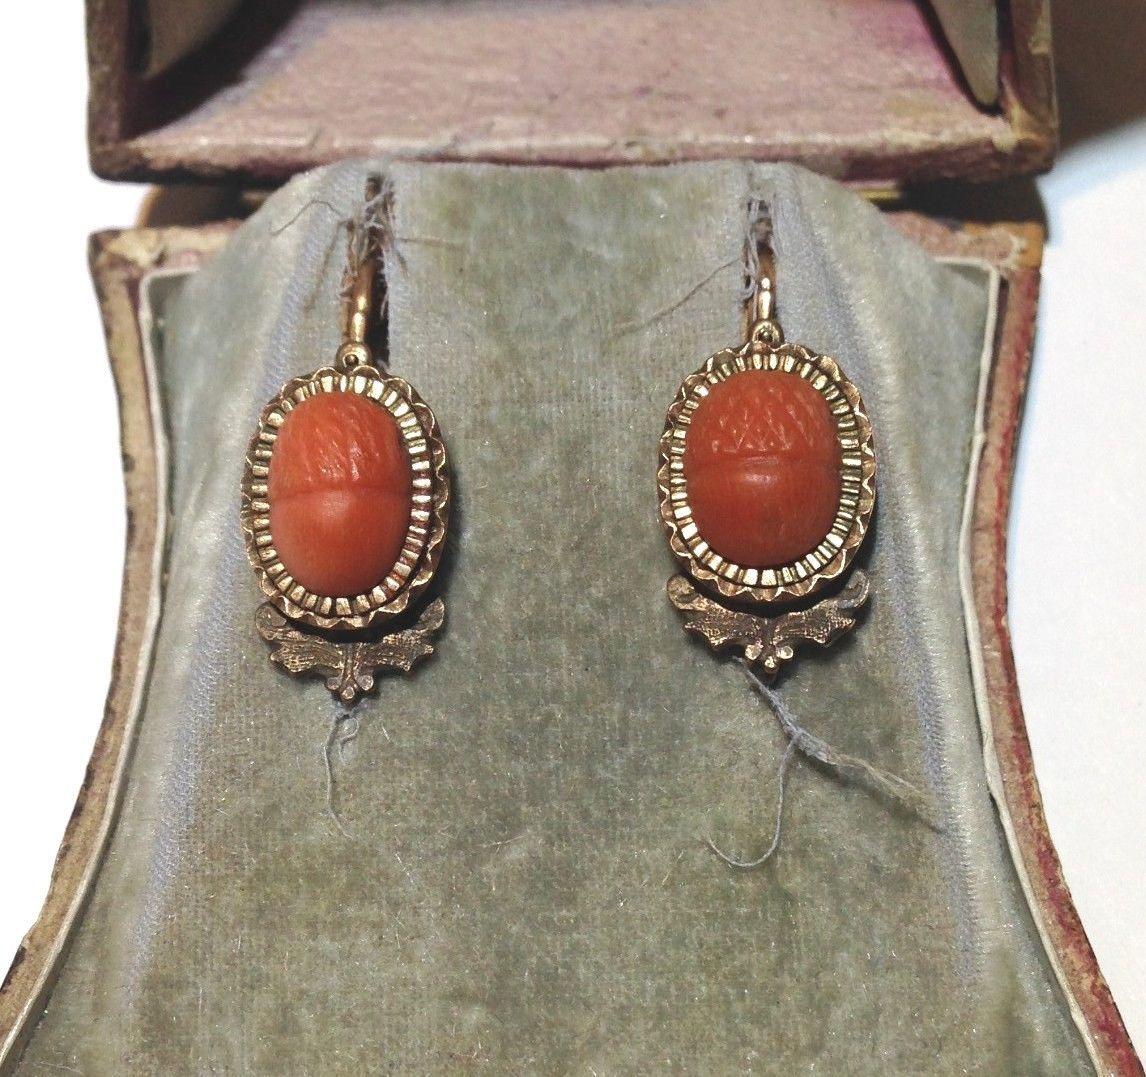 Wonderful Antique Carved Coral Acorn Victorian 14k Rose Gold Earrings   eBay